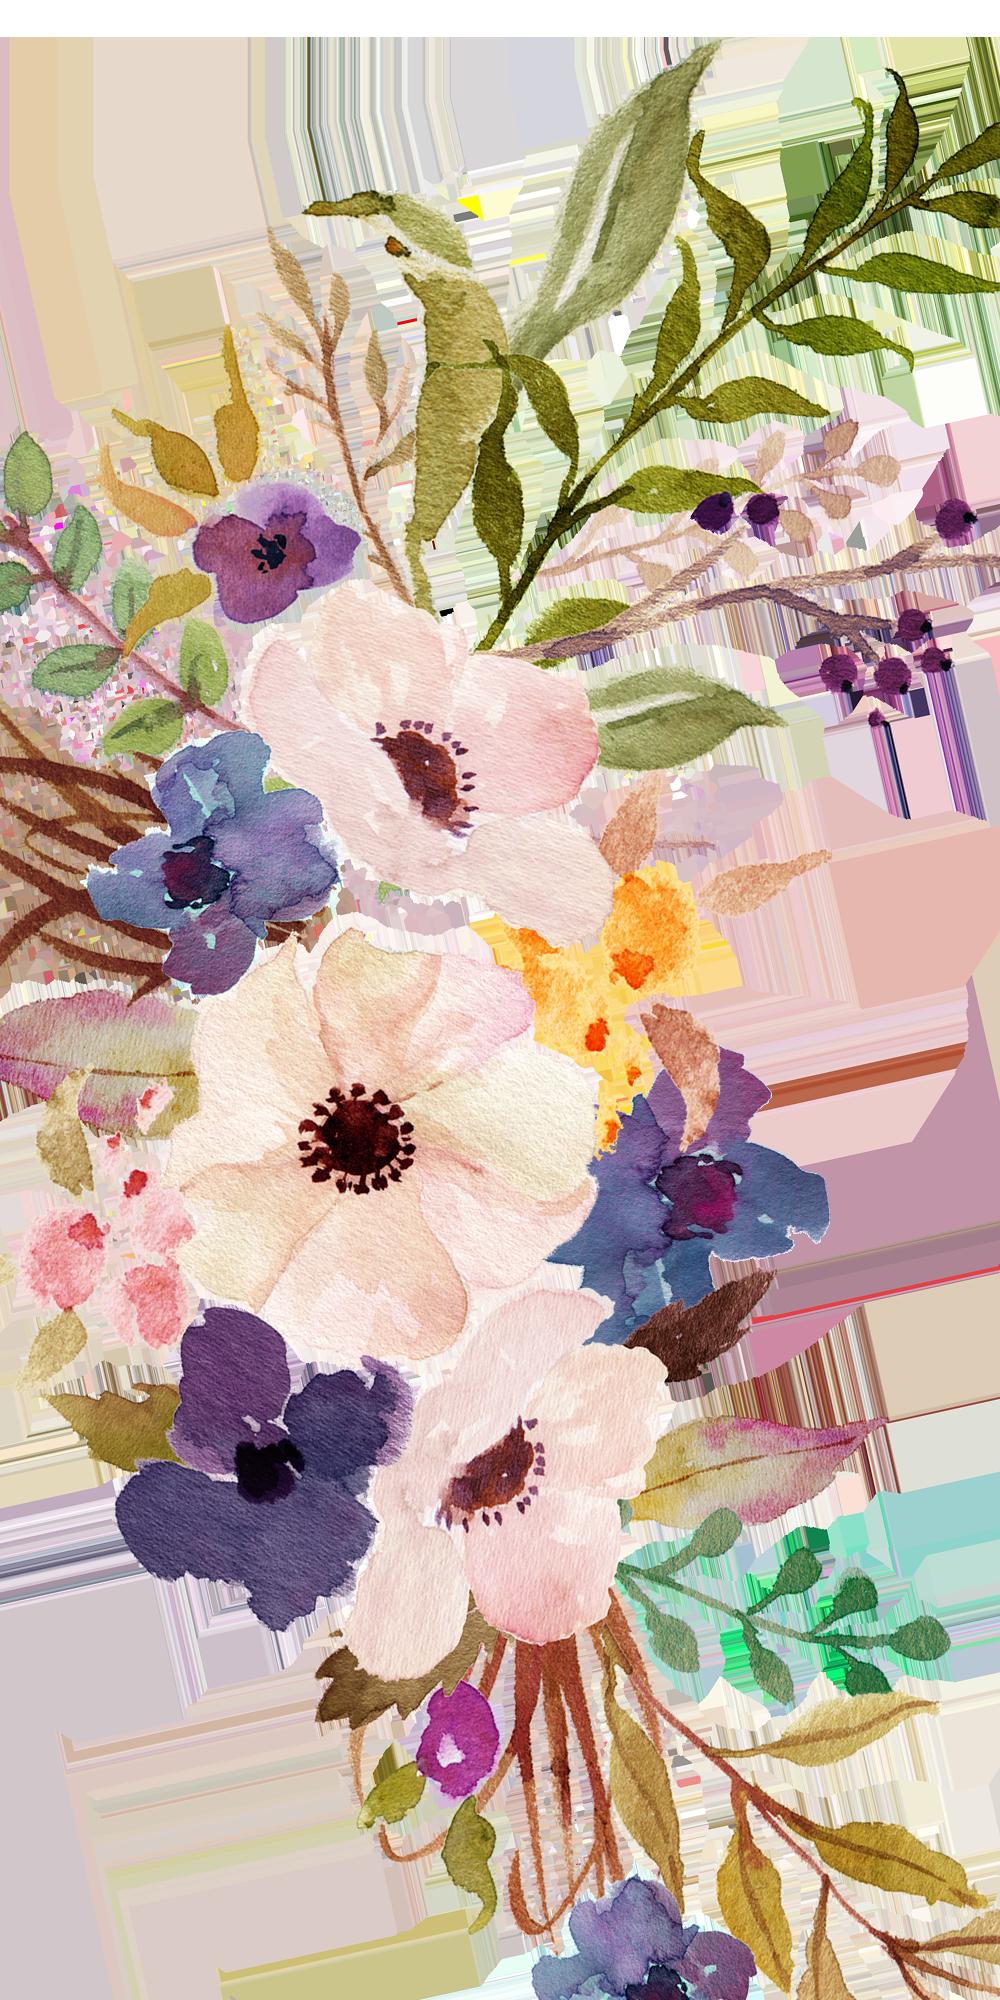 Flower Bouquet Casetify Iphone Floral Art Design